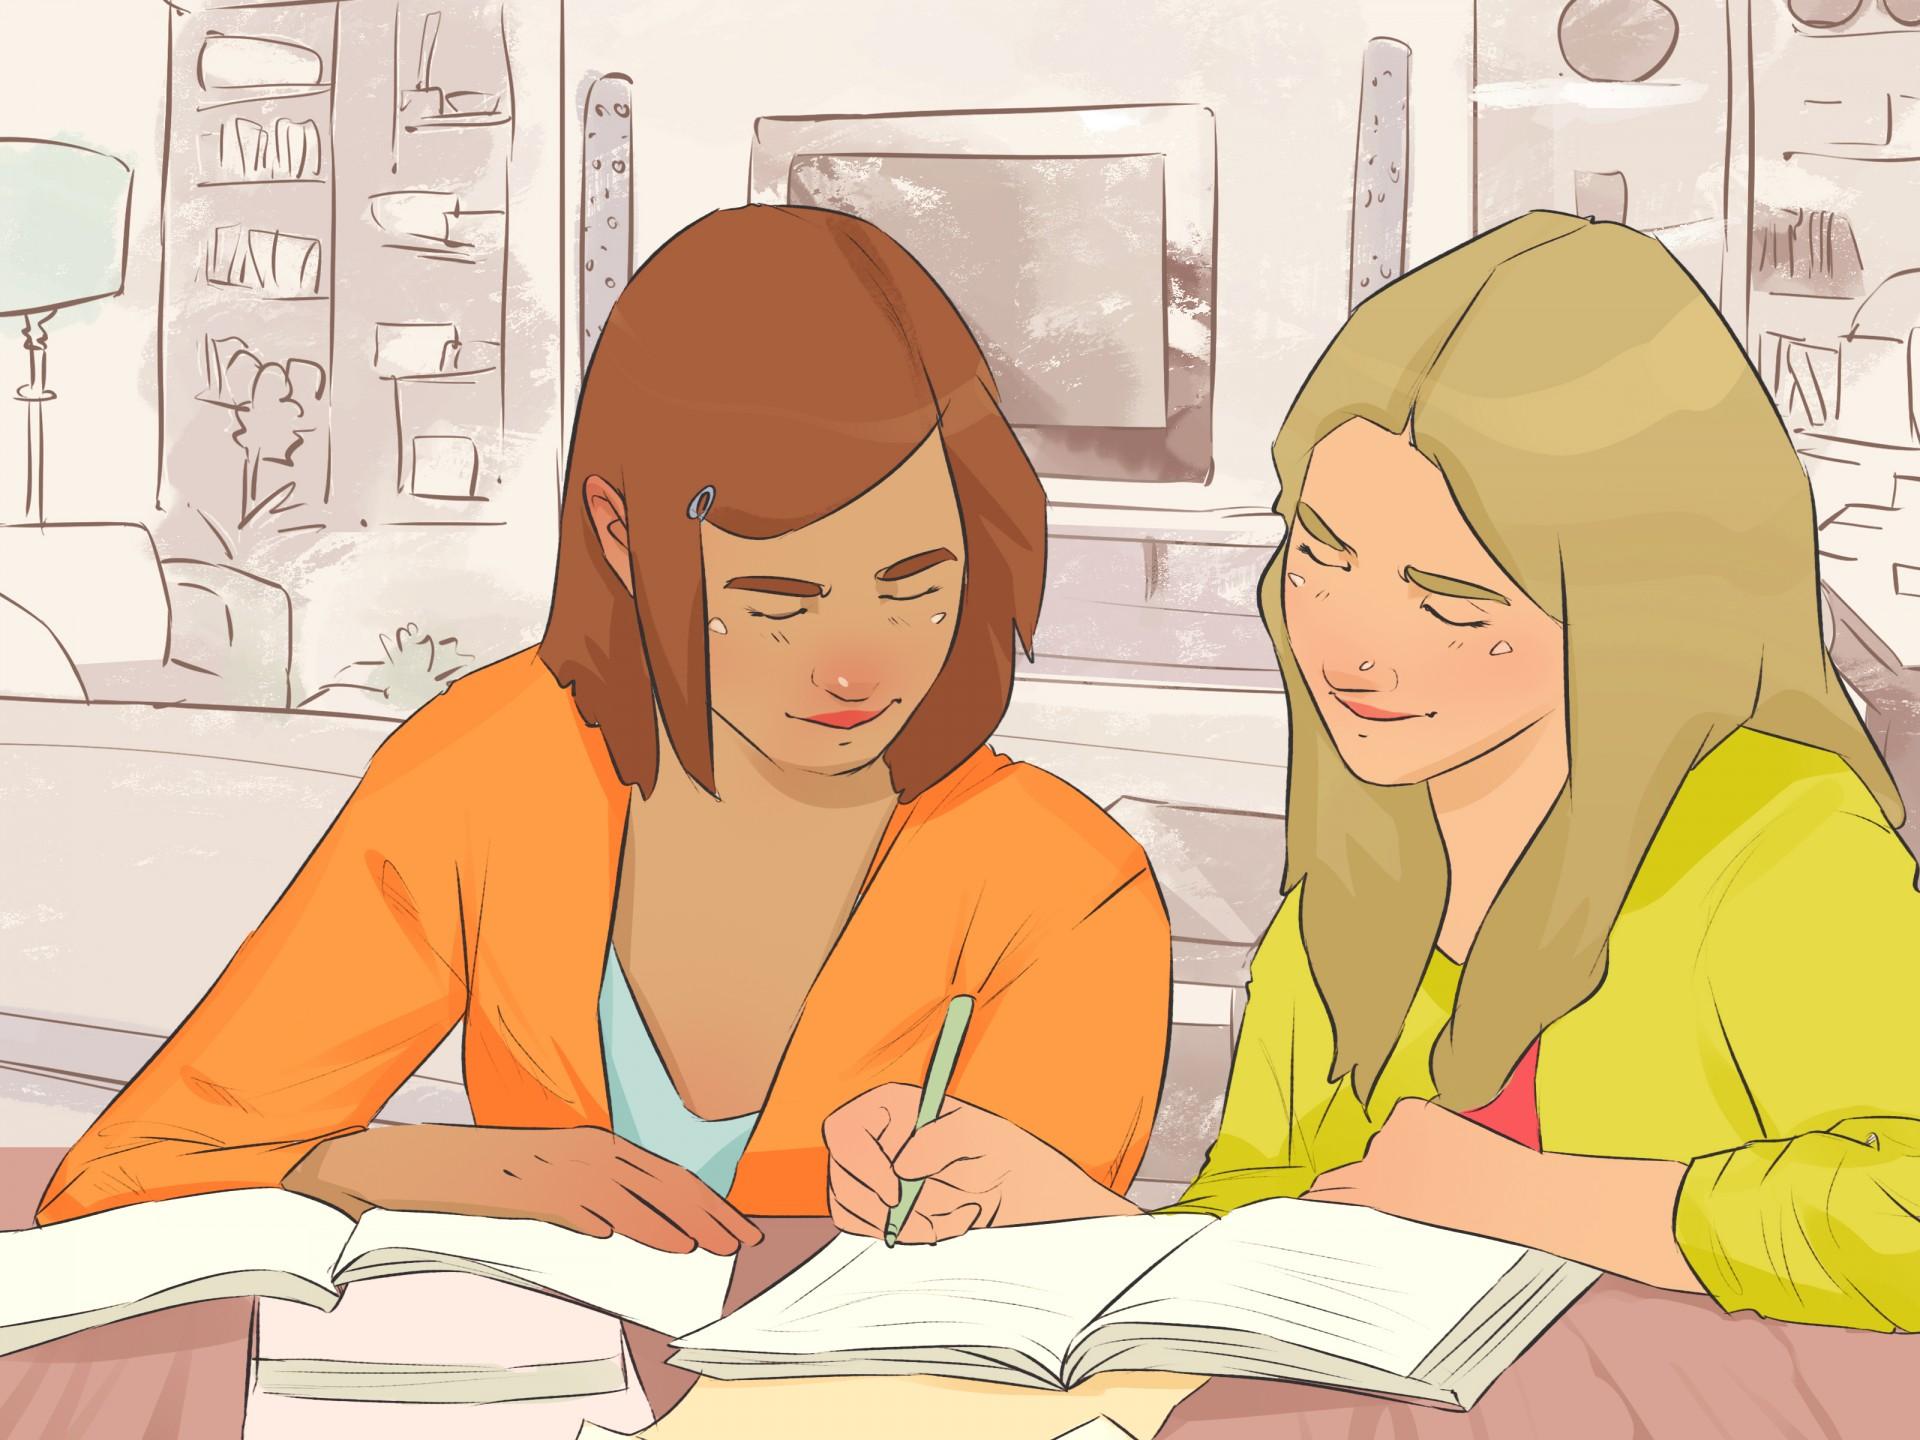 018 Write An Academic Essay Step Wondrous Example 2000 Words Outline Pdf 2500 1920